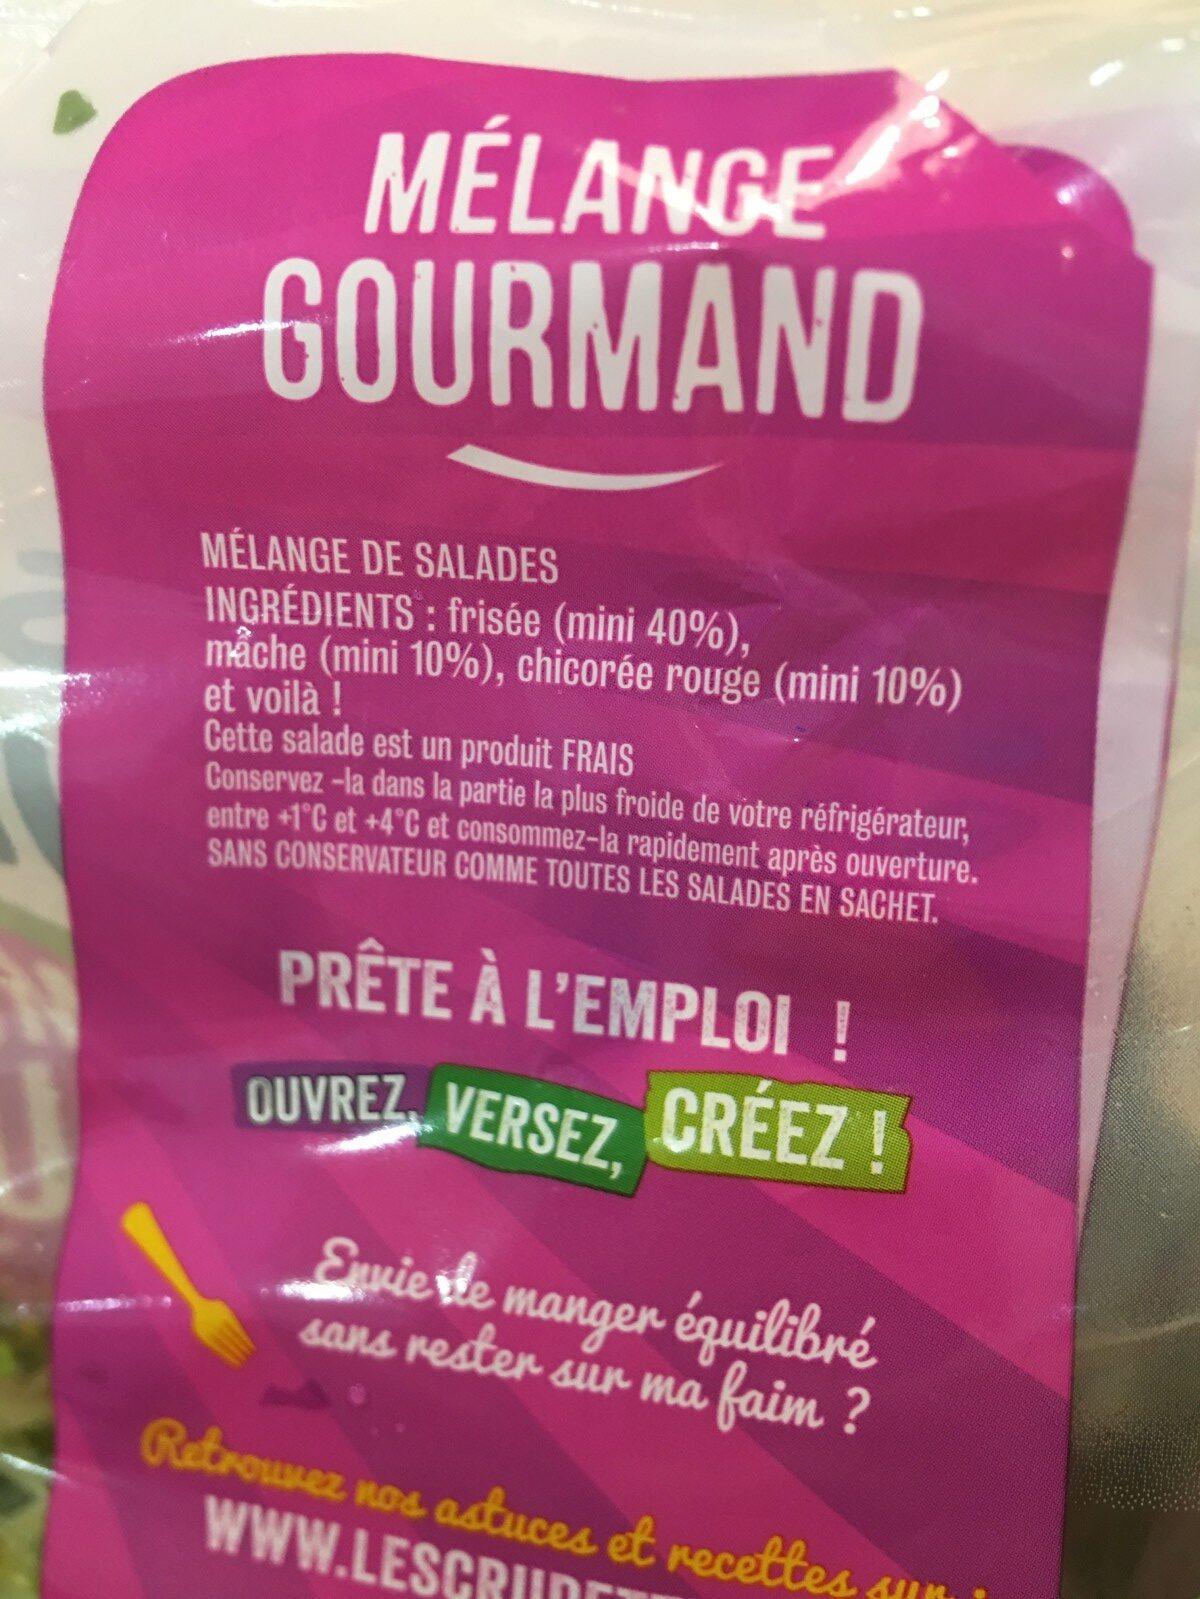 Les Crudettes - Mélange gourmand - Ingrediënten